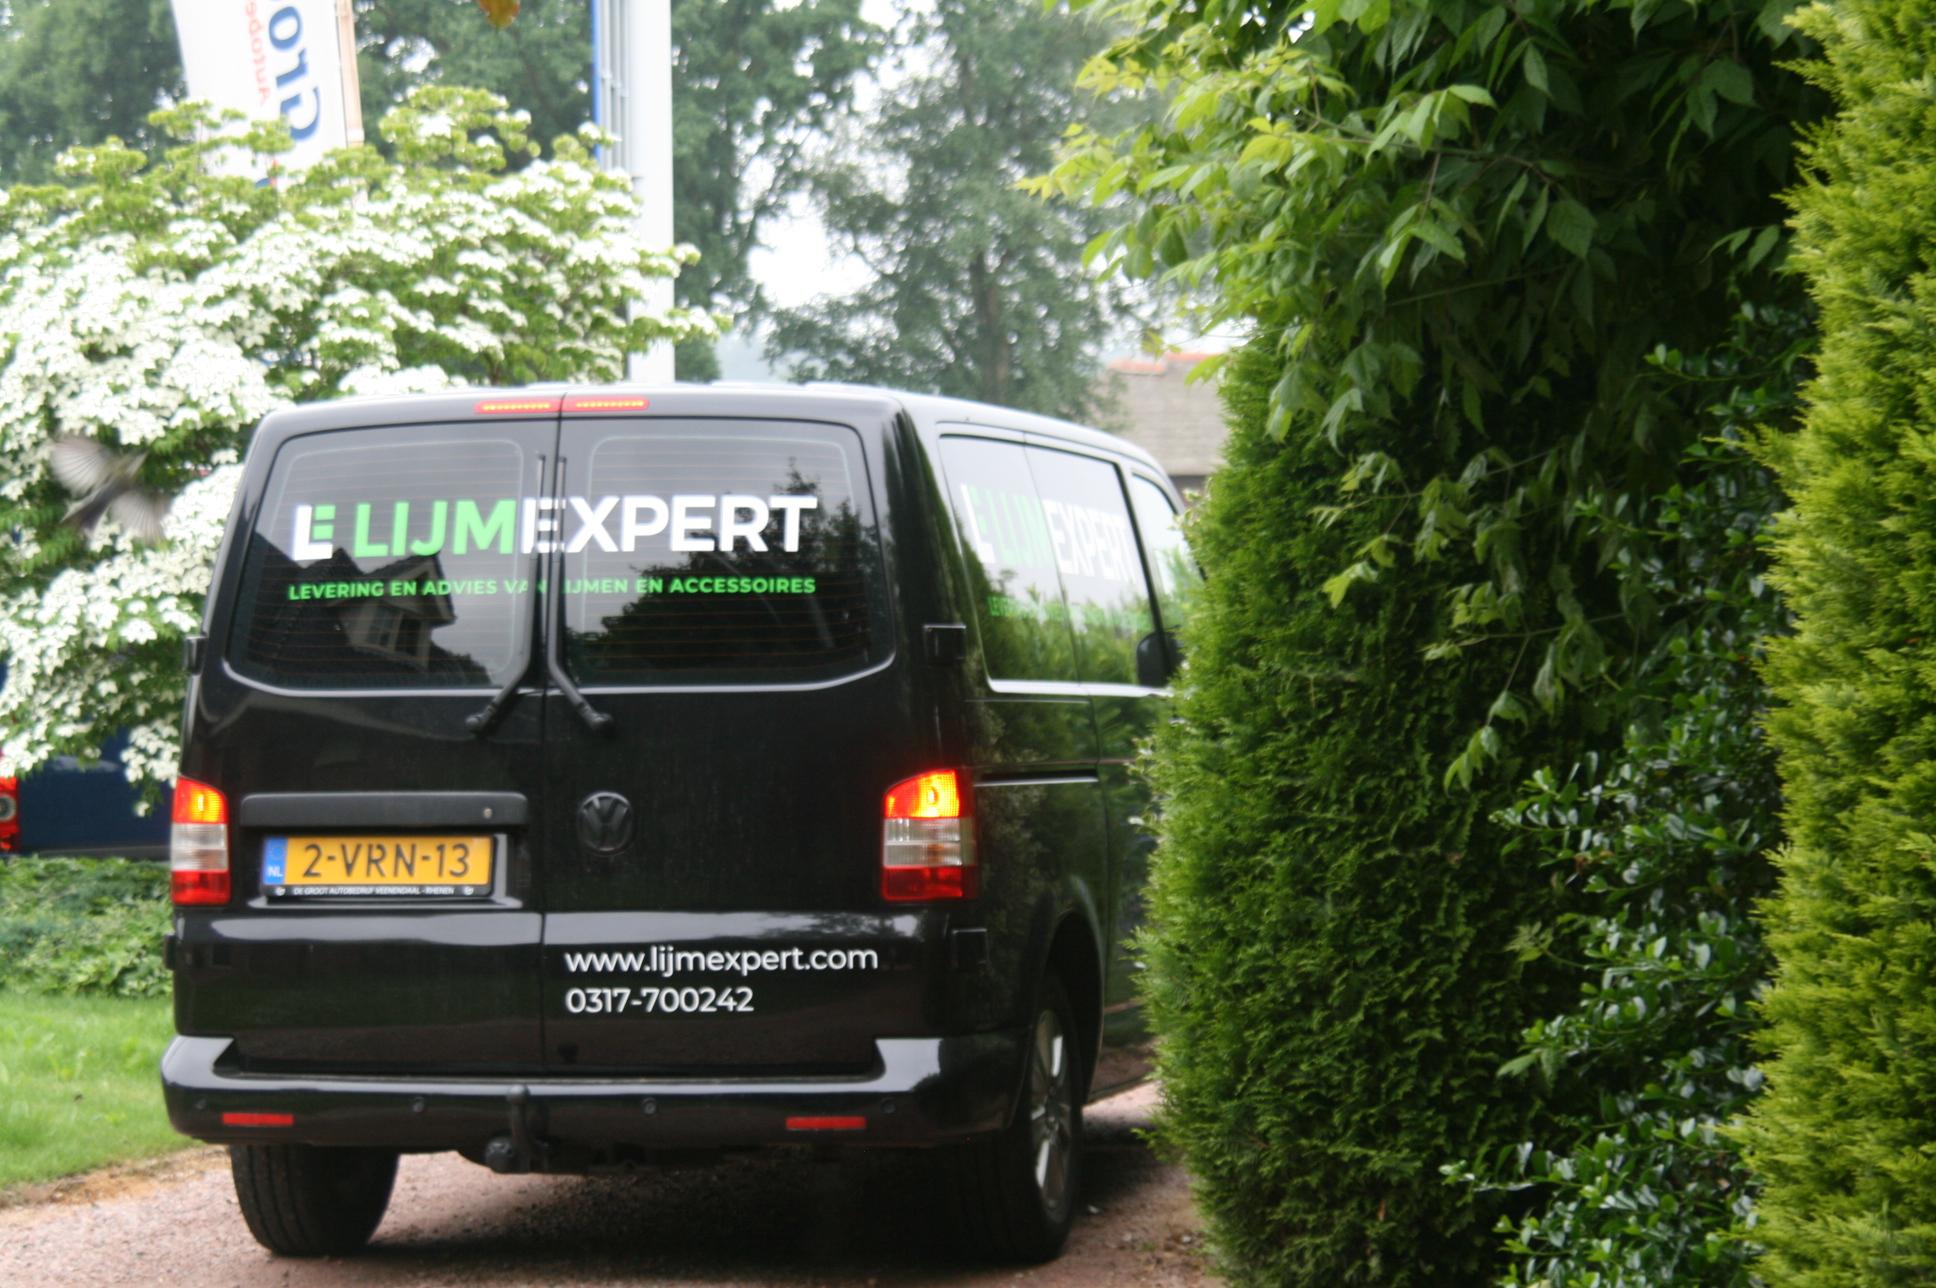 Lijm-expert BV